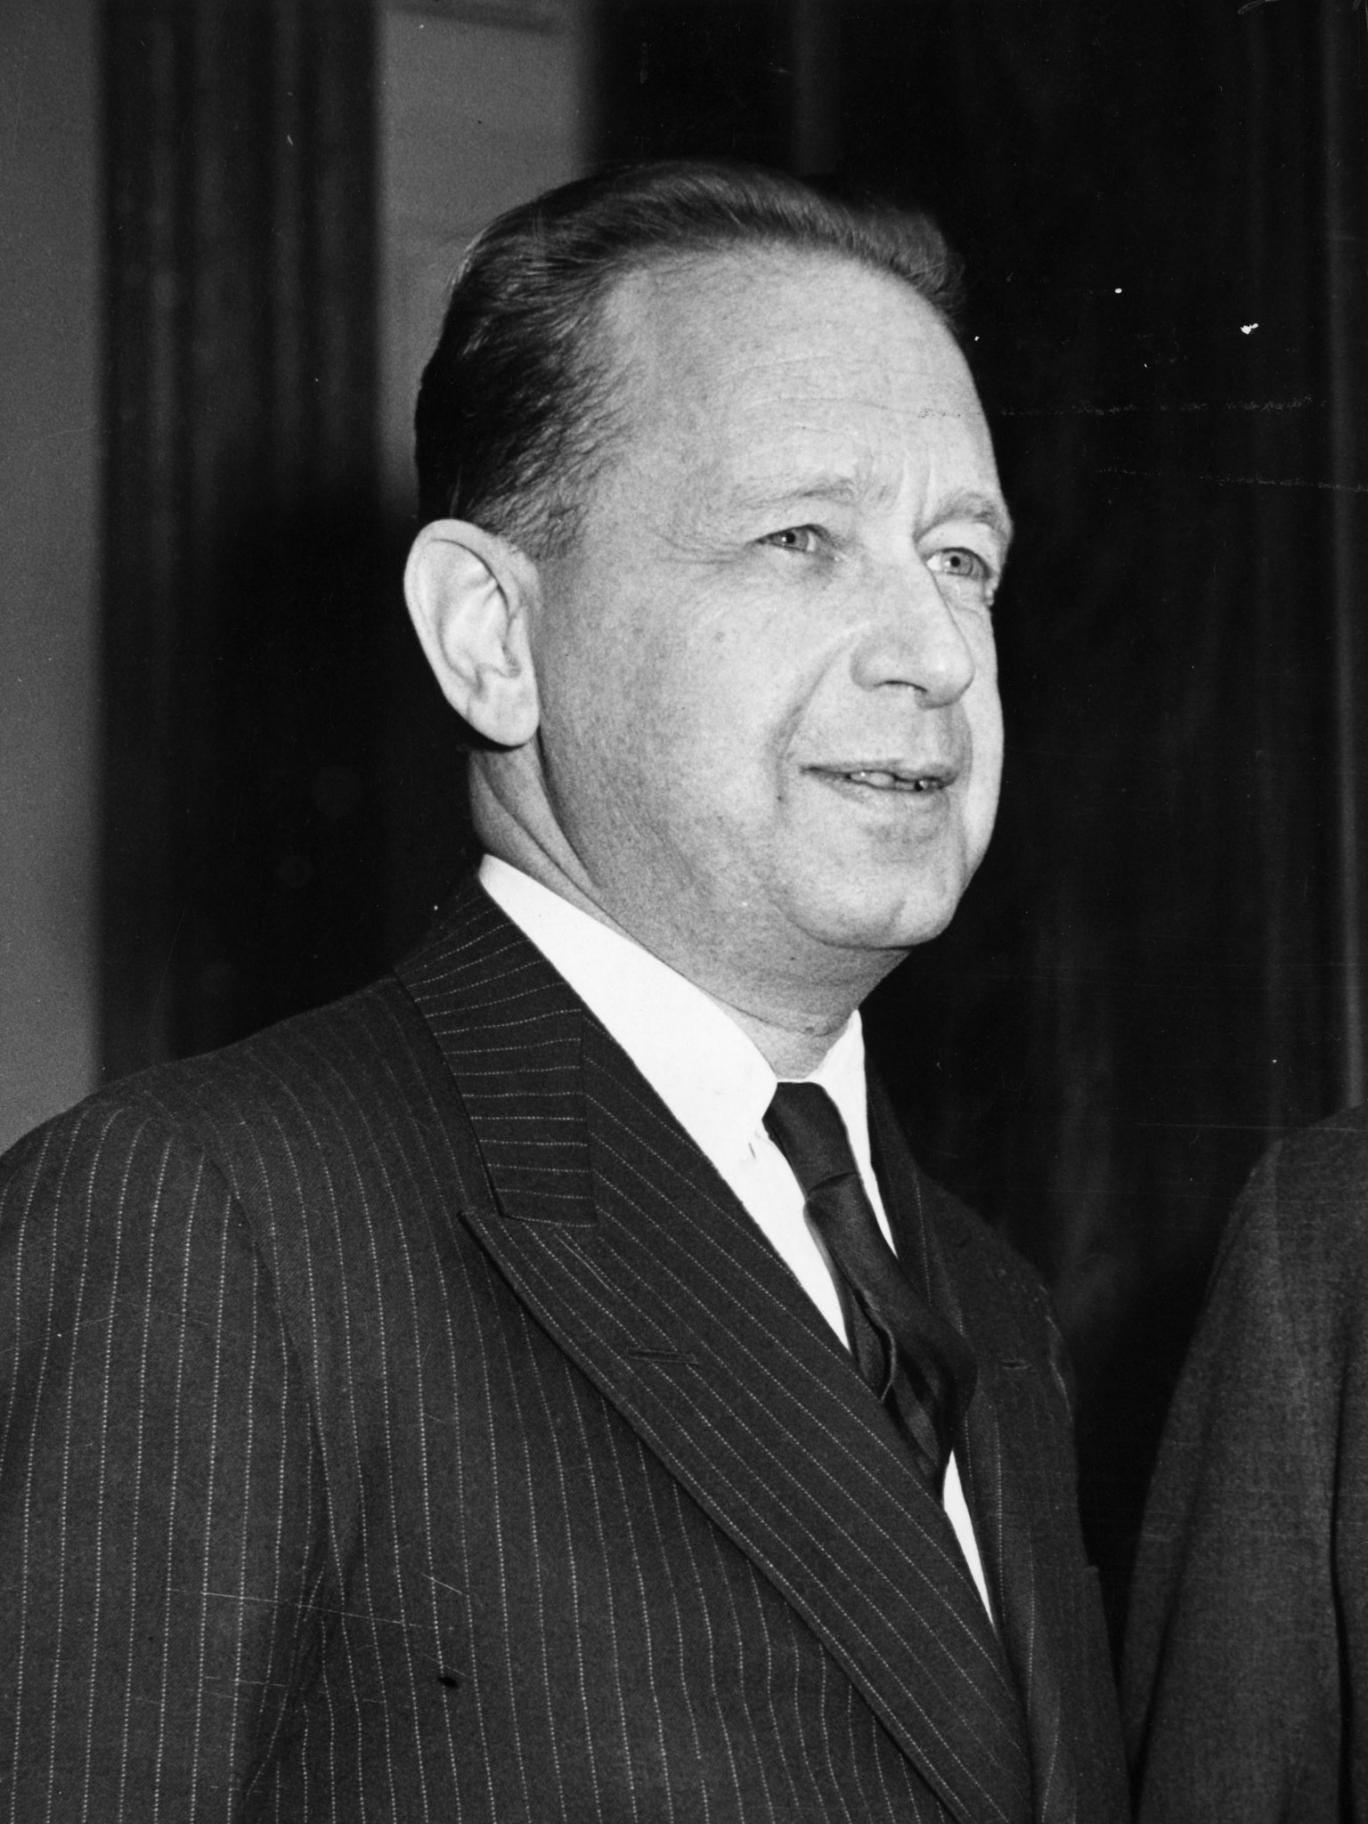 Circa 1960: Swedish statesman Dag Hammarskjold